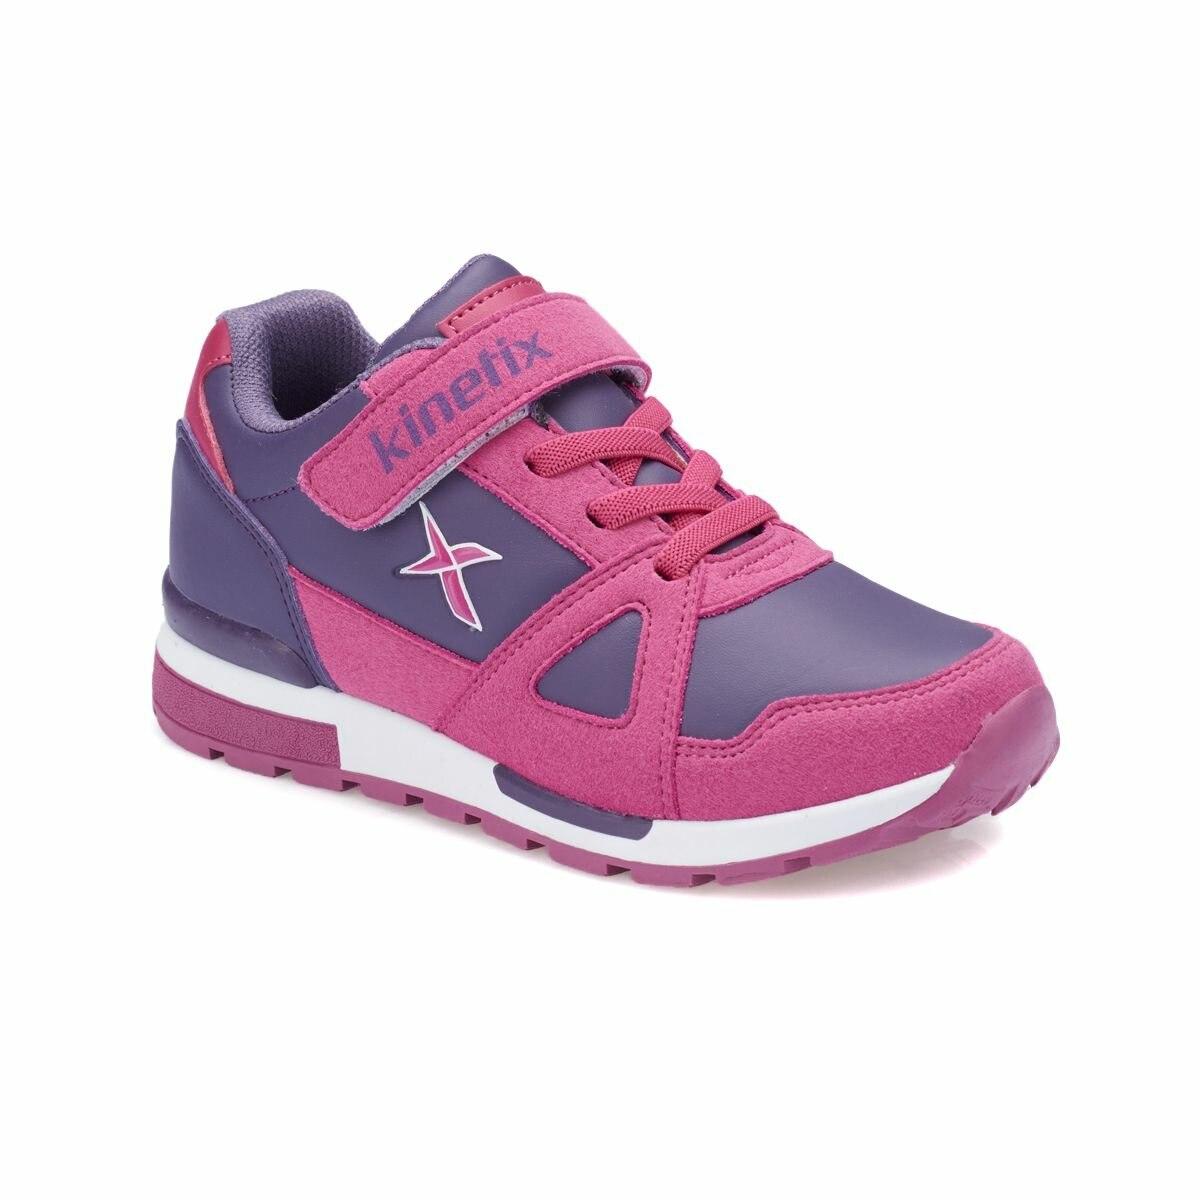 FLO RIVERO PU Purple Female Child Sneaker Shoes KINETIX